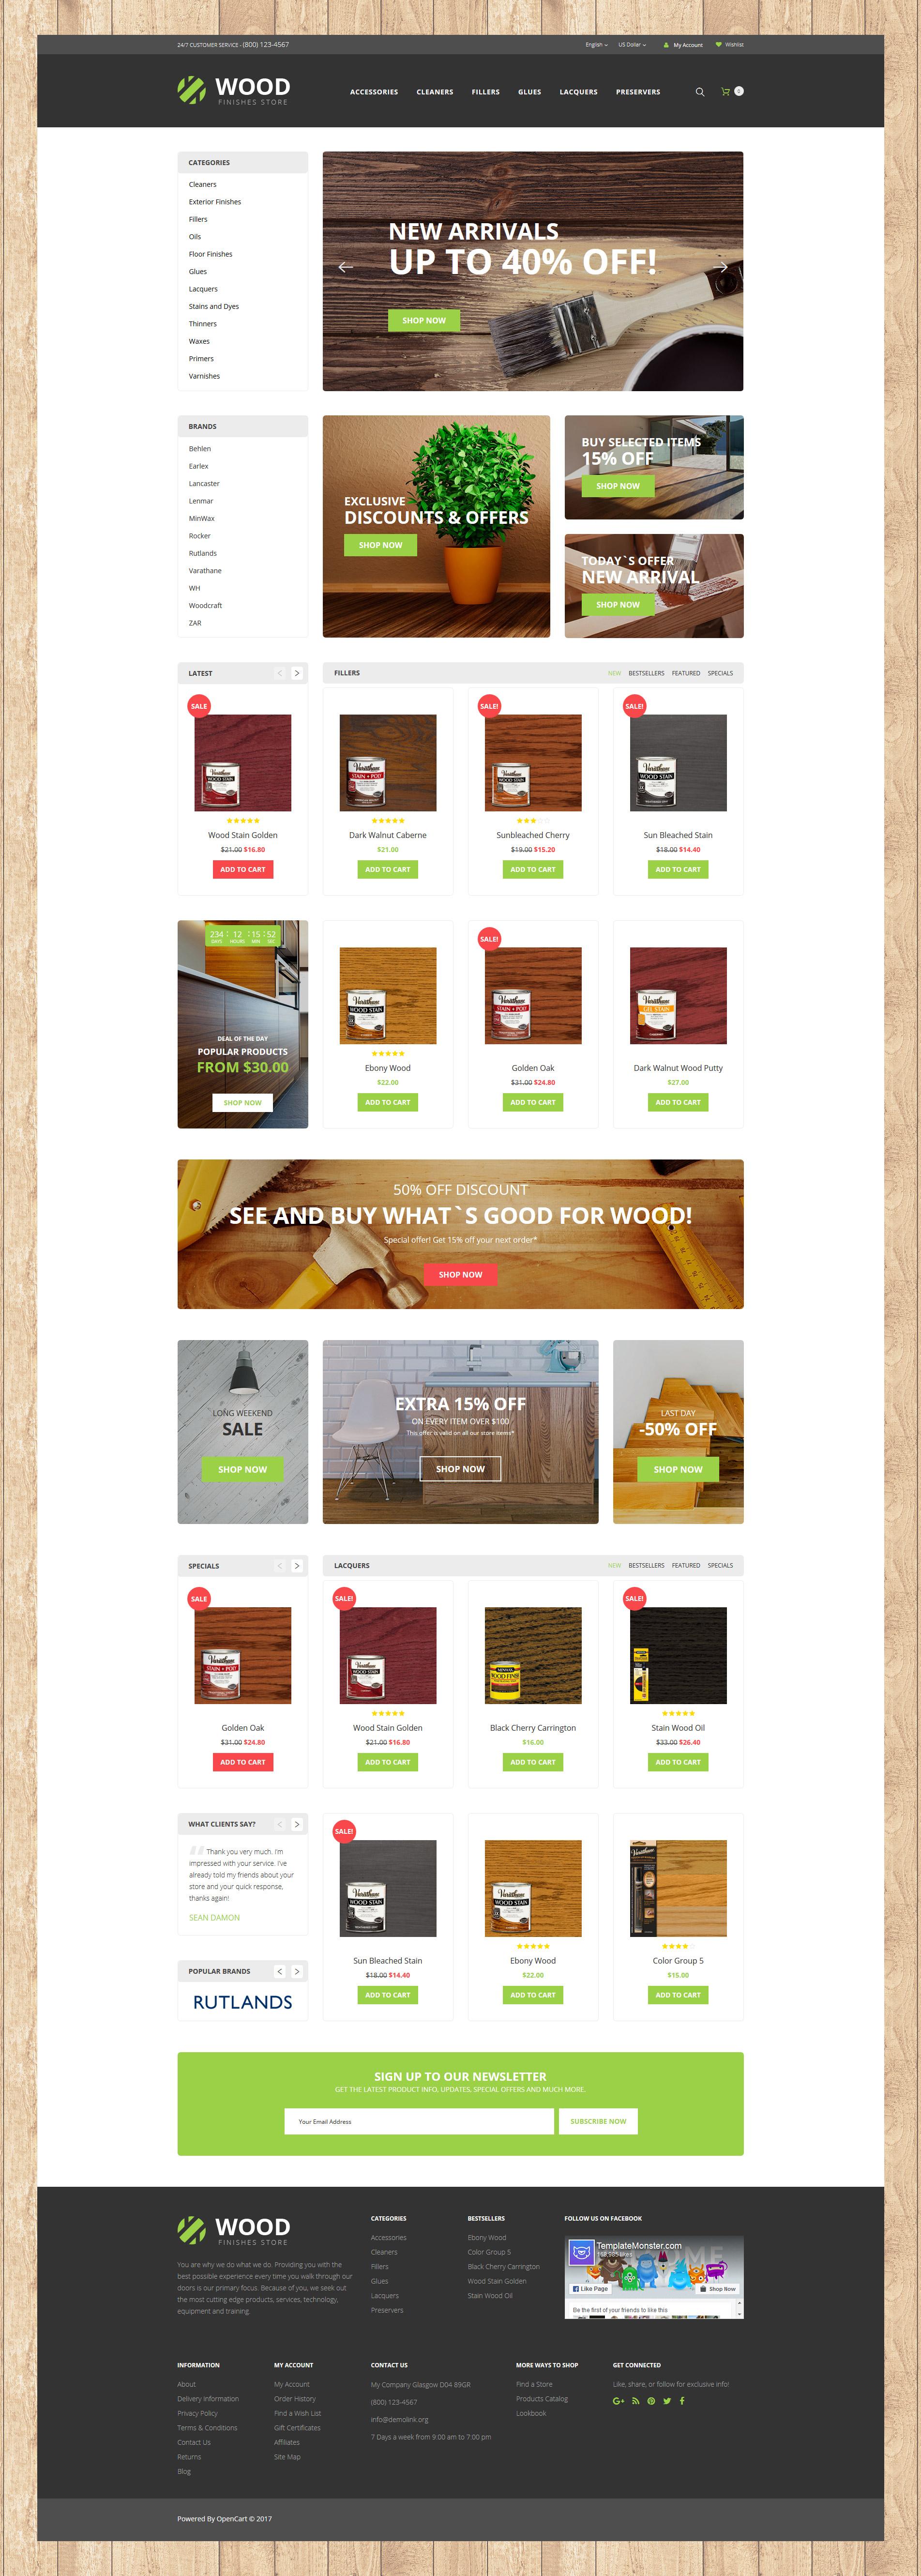 Wood Finishes Responsive №62201 - скриншот